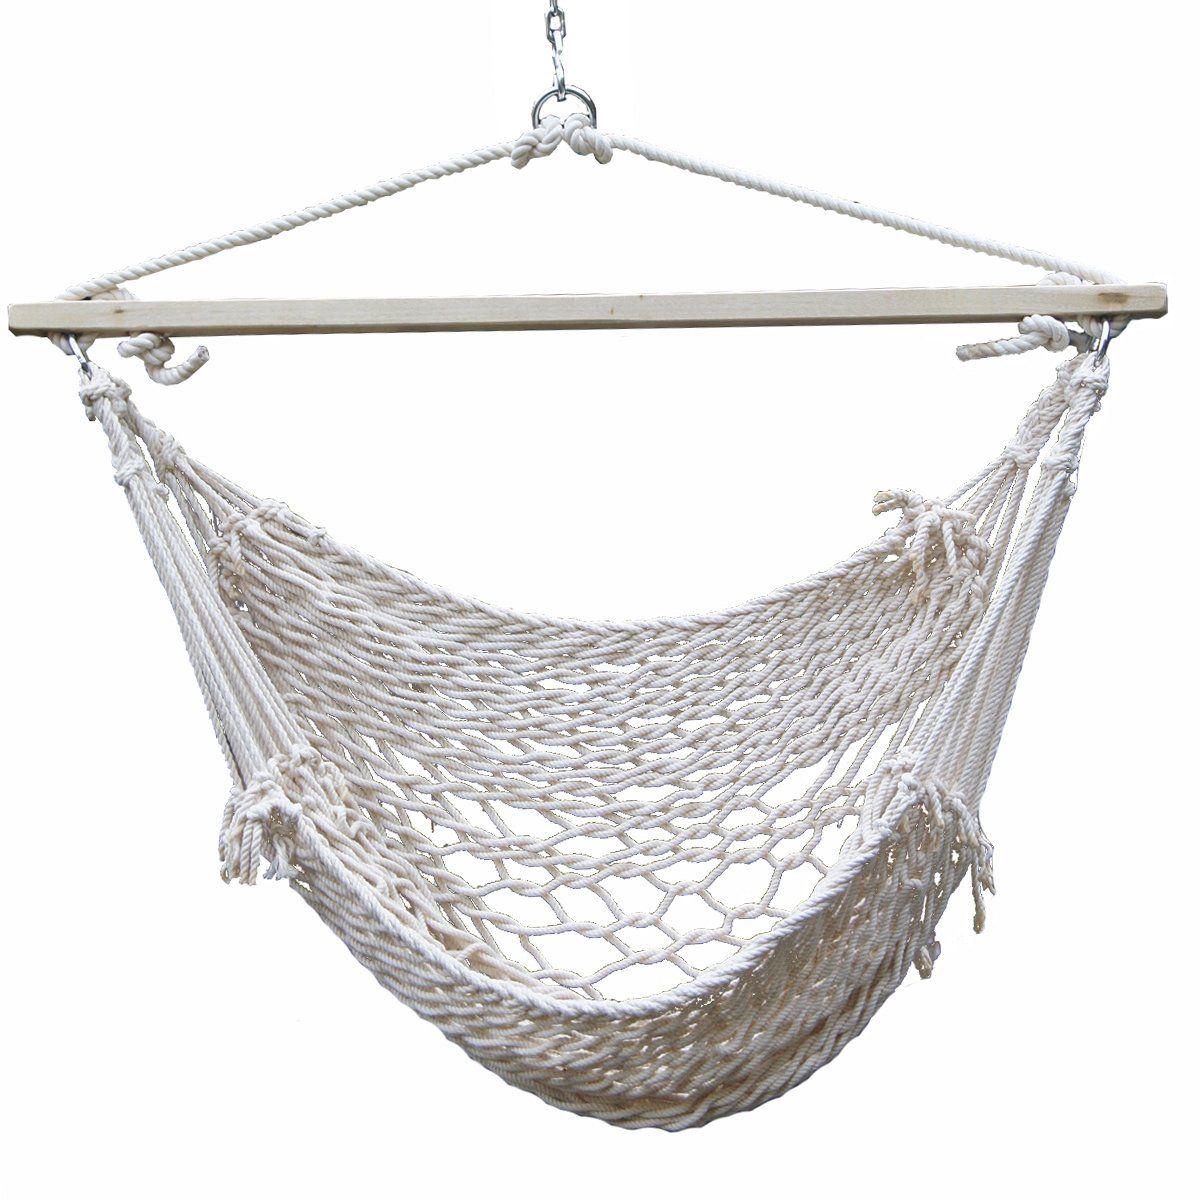 Prime garden deluxe cotton rope swing chair hand woven hammock